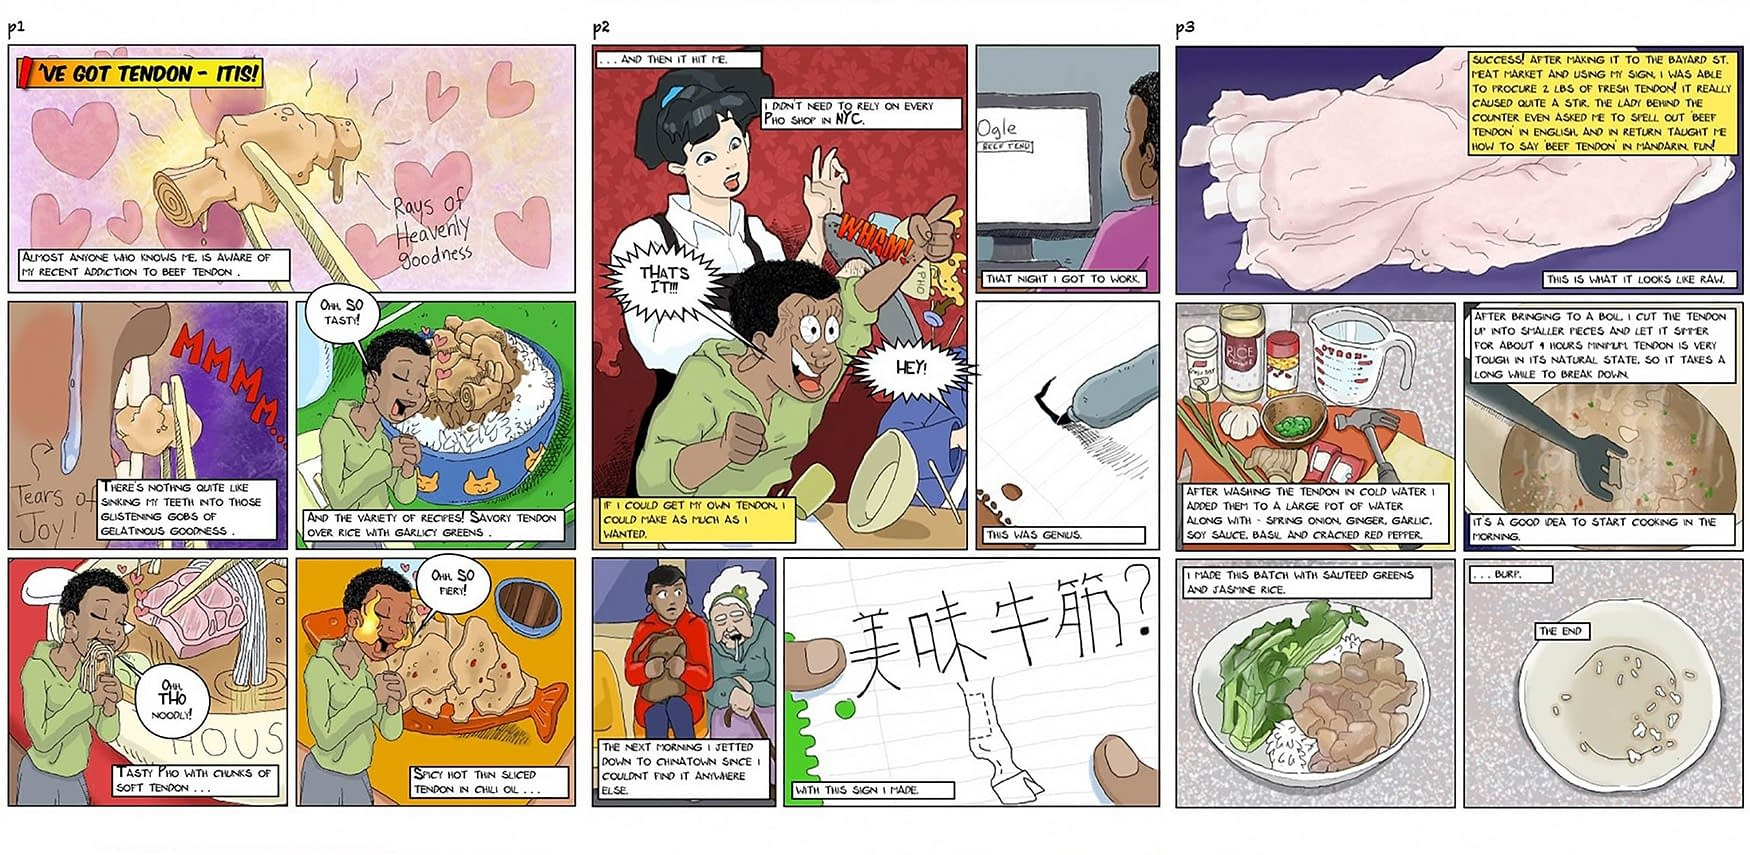 Dieselfunk Dispatch: Making Malice with Comic Creator Micheline Hess